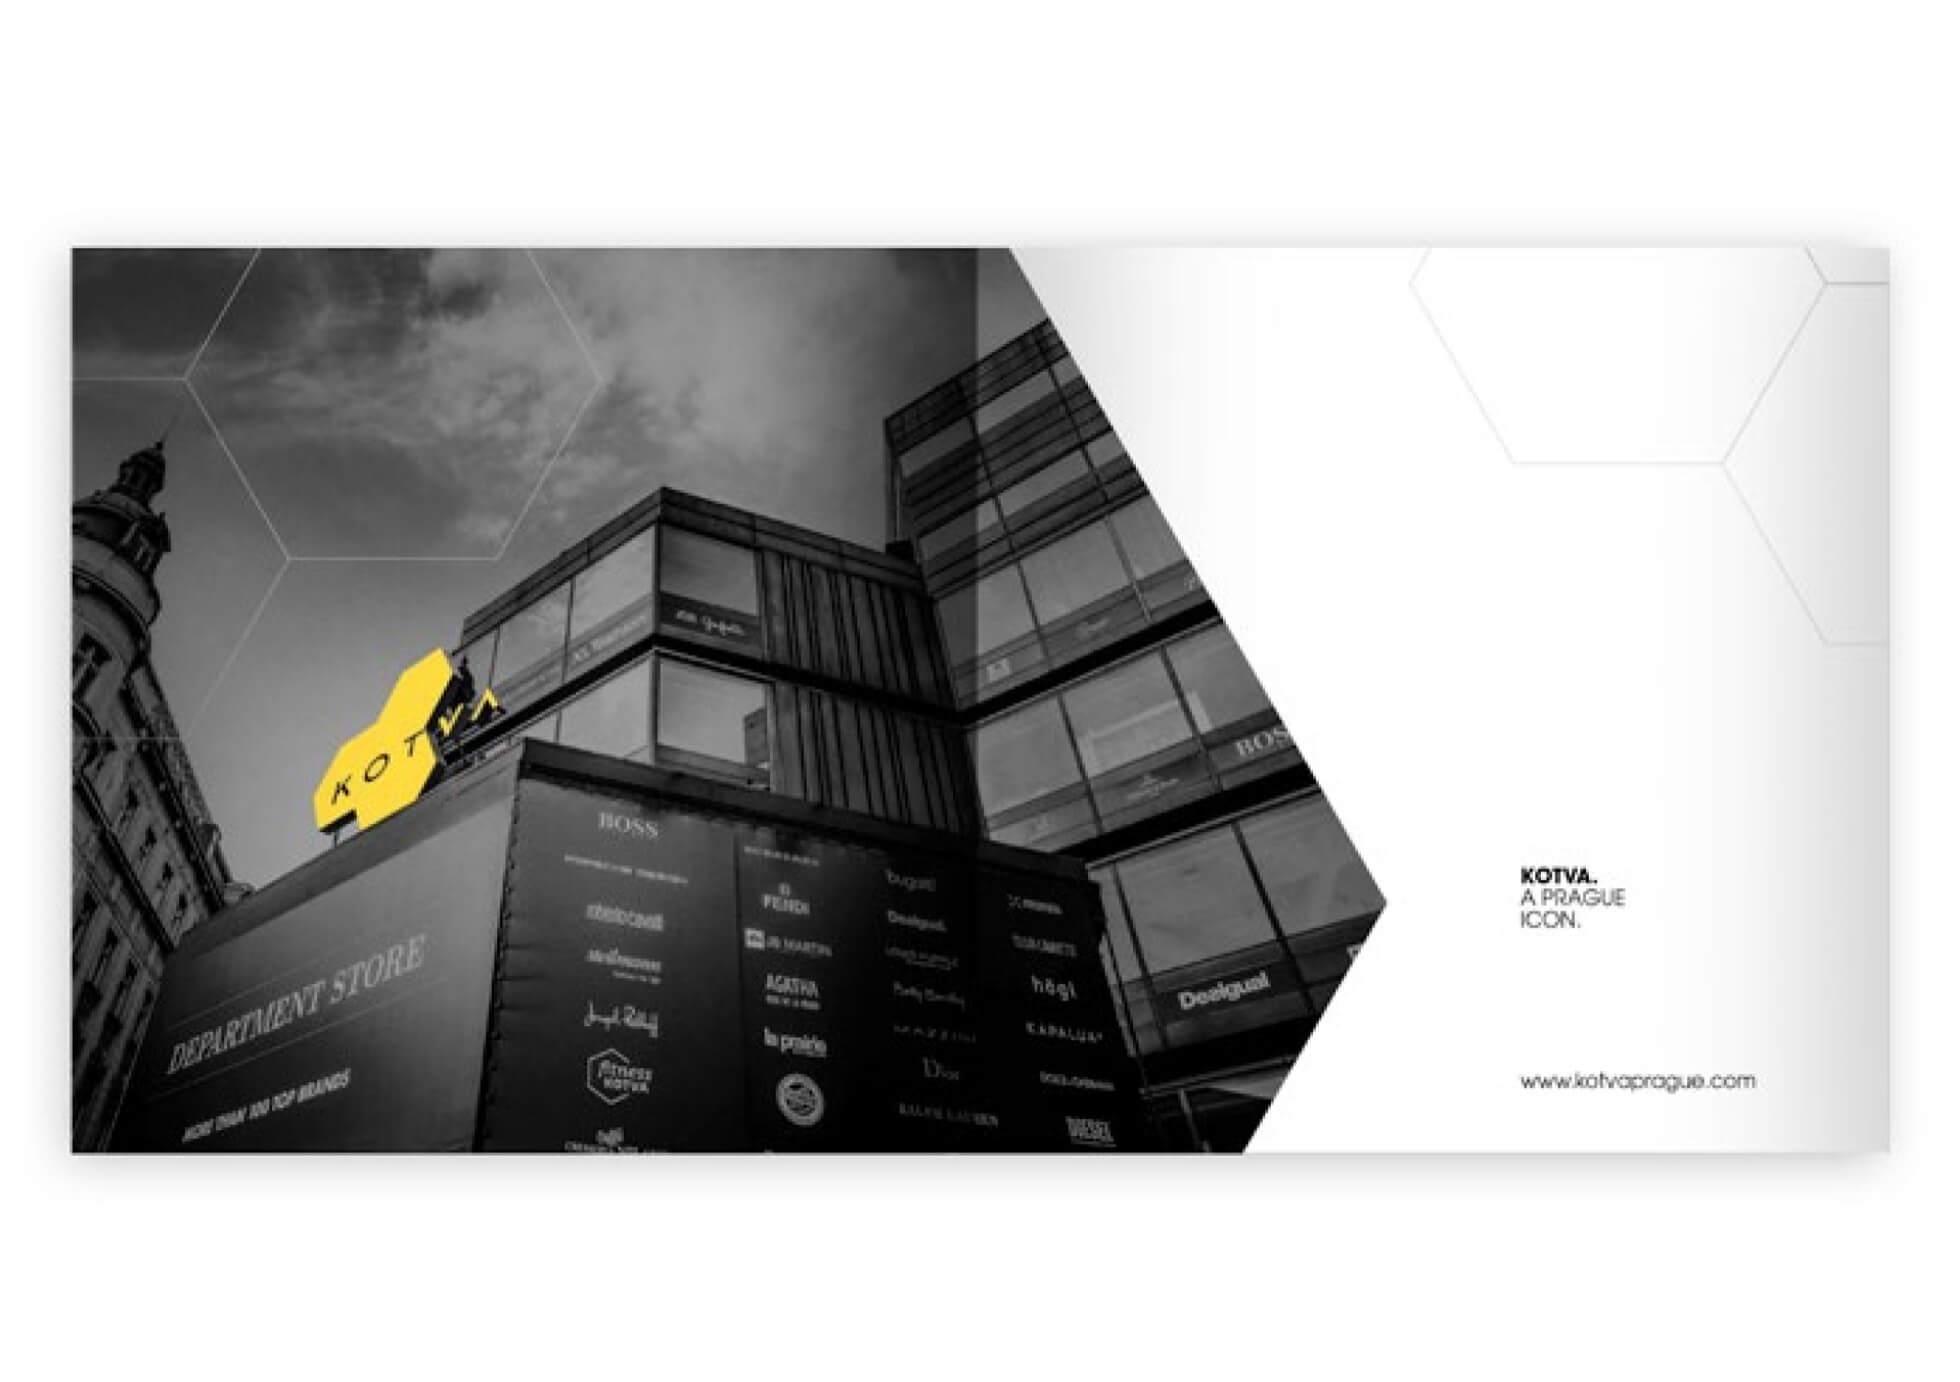 design for real estate B2B